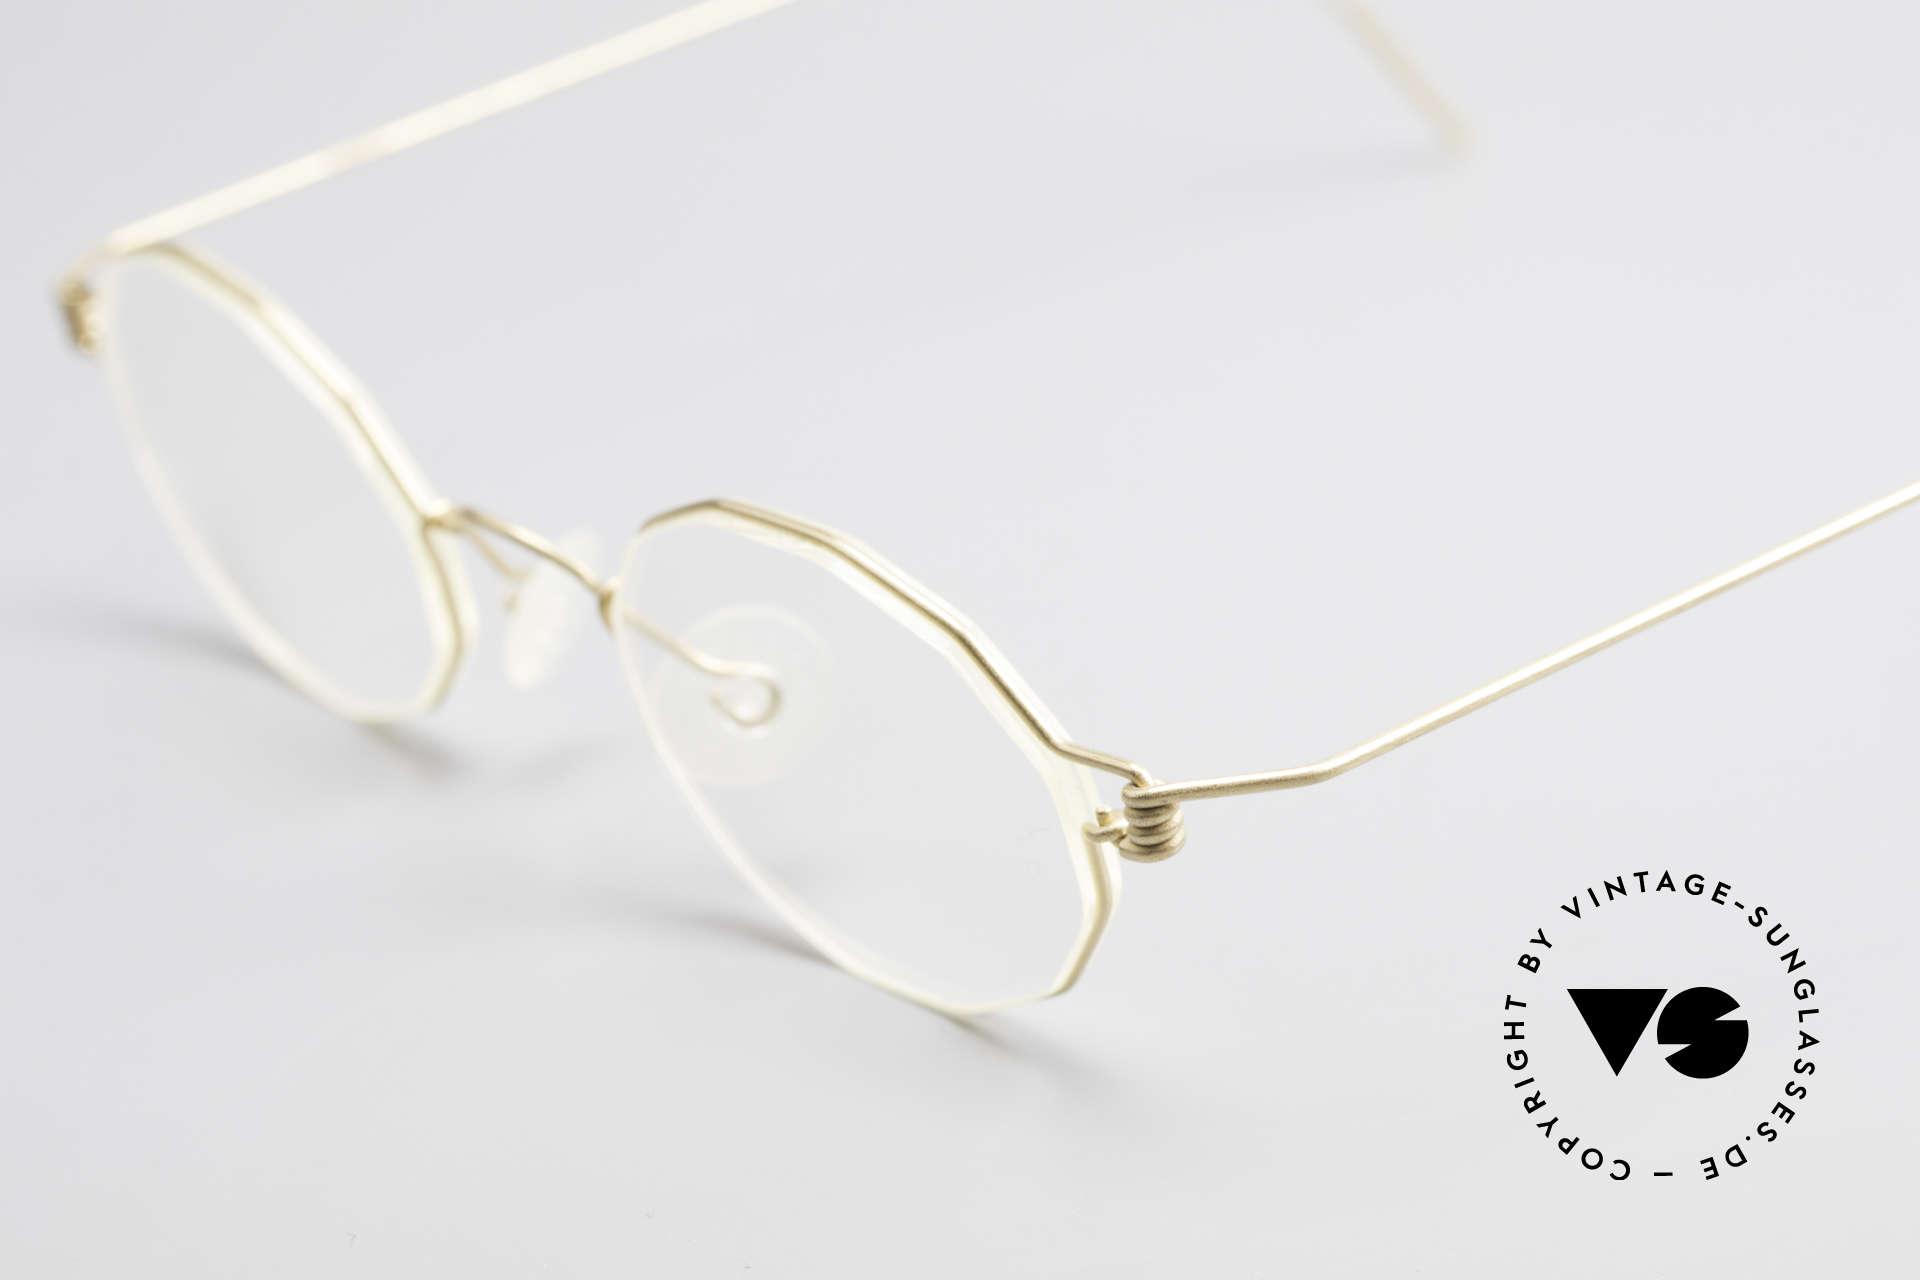 Lindberg Zeta Air Titan Rim Small Titanium Brille Unisex, ungetragenes Designerstück + orig. Lindberg Magnet-Etui, Passend für Herren und Damen